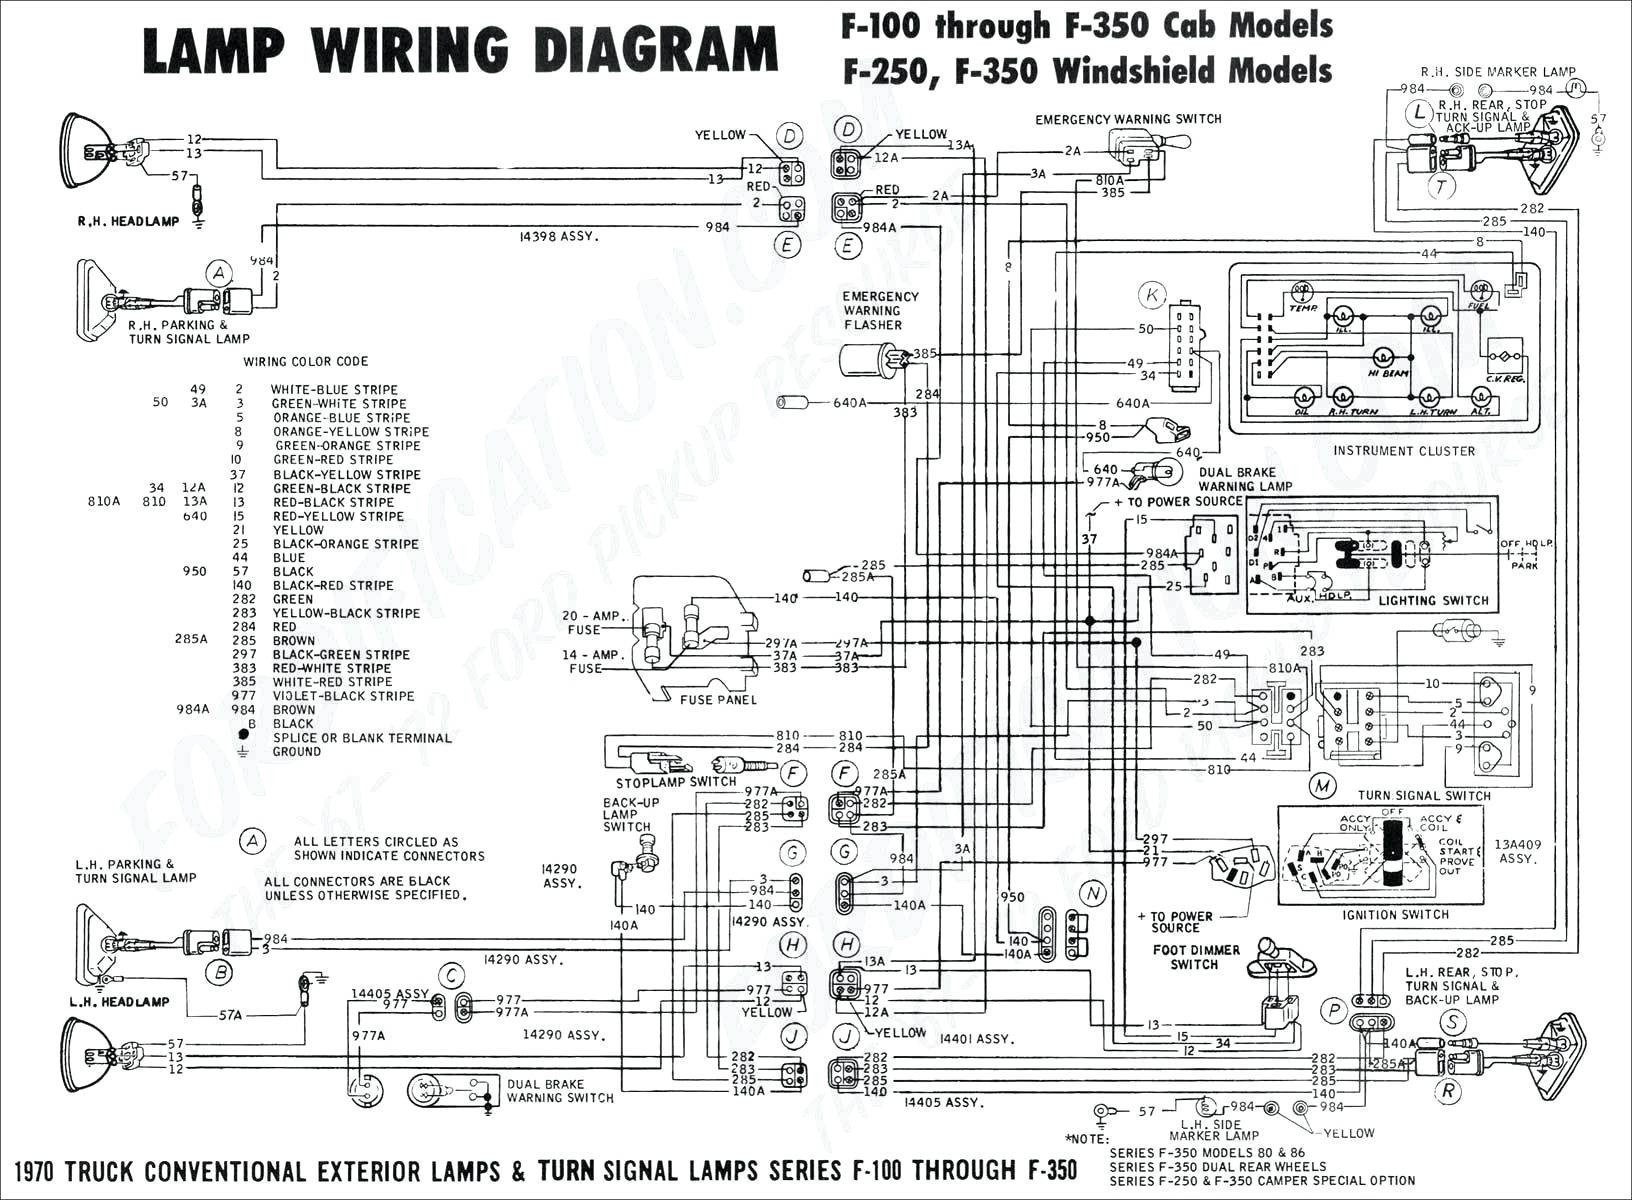 R32 Engine Wiring DiagramWiring Diagram